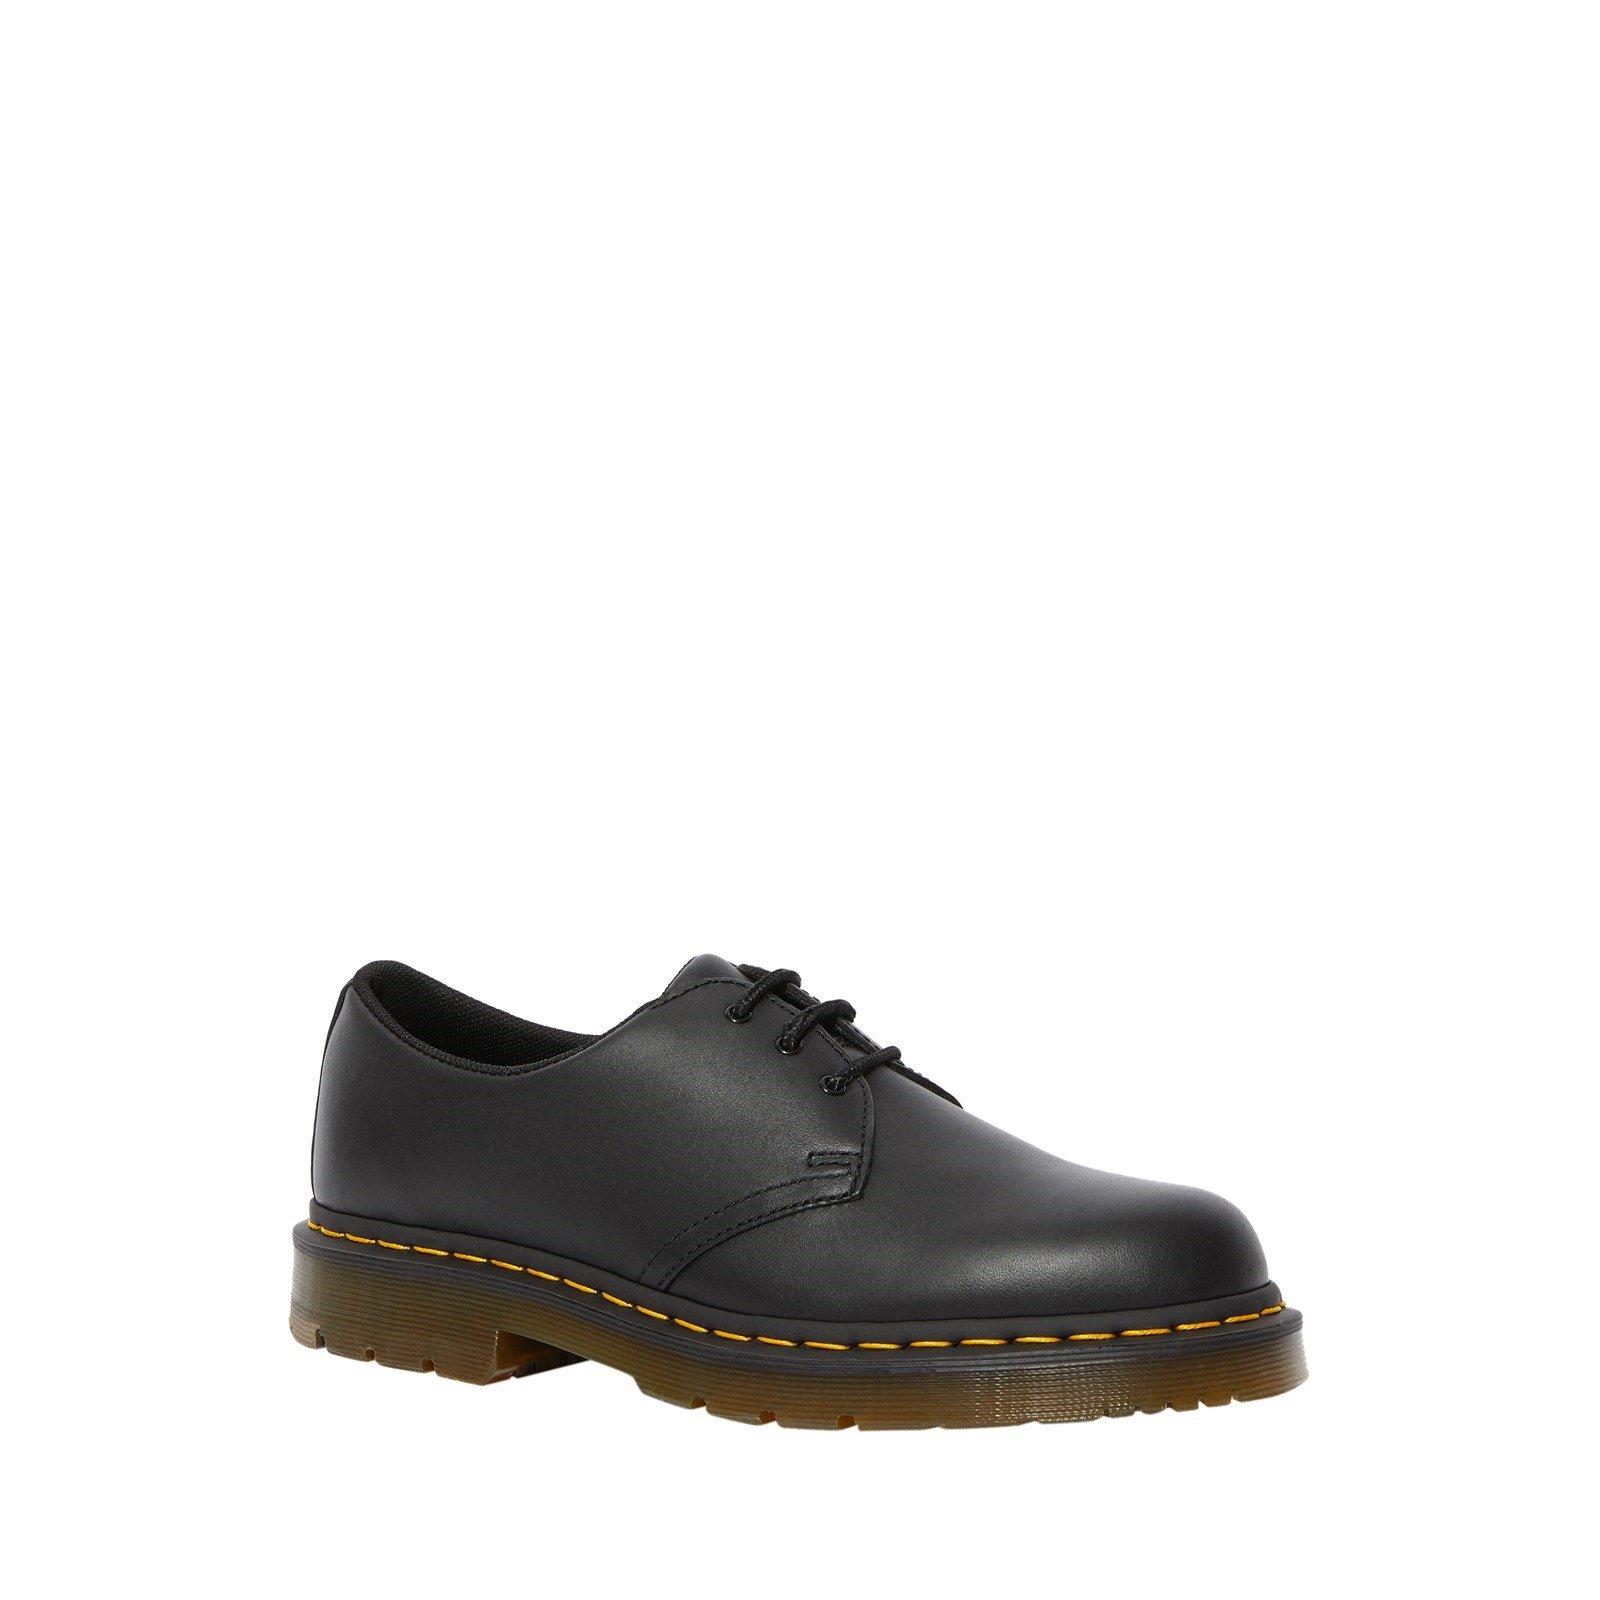 Dr Martens Unisex Slip Resistant Leather Shoes Black 34025 - Black 3